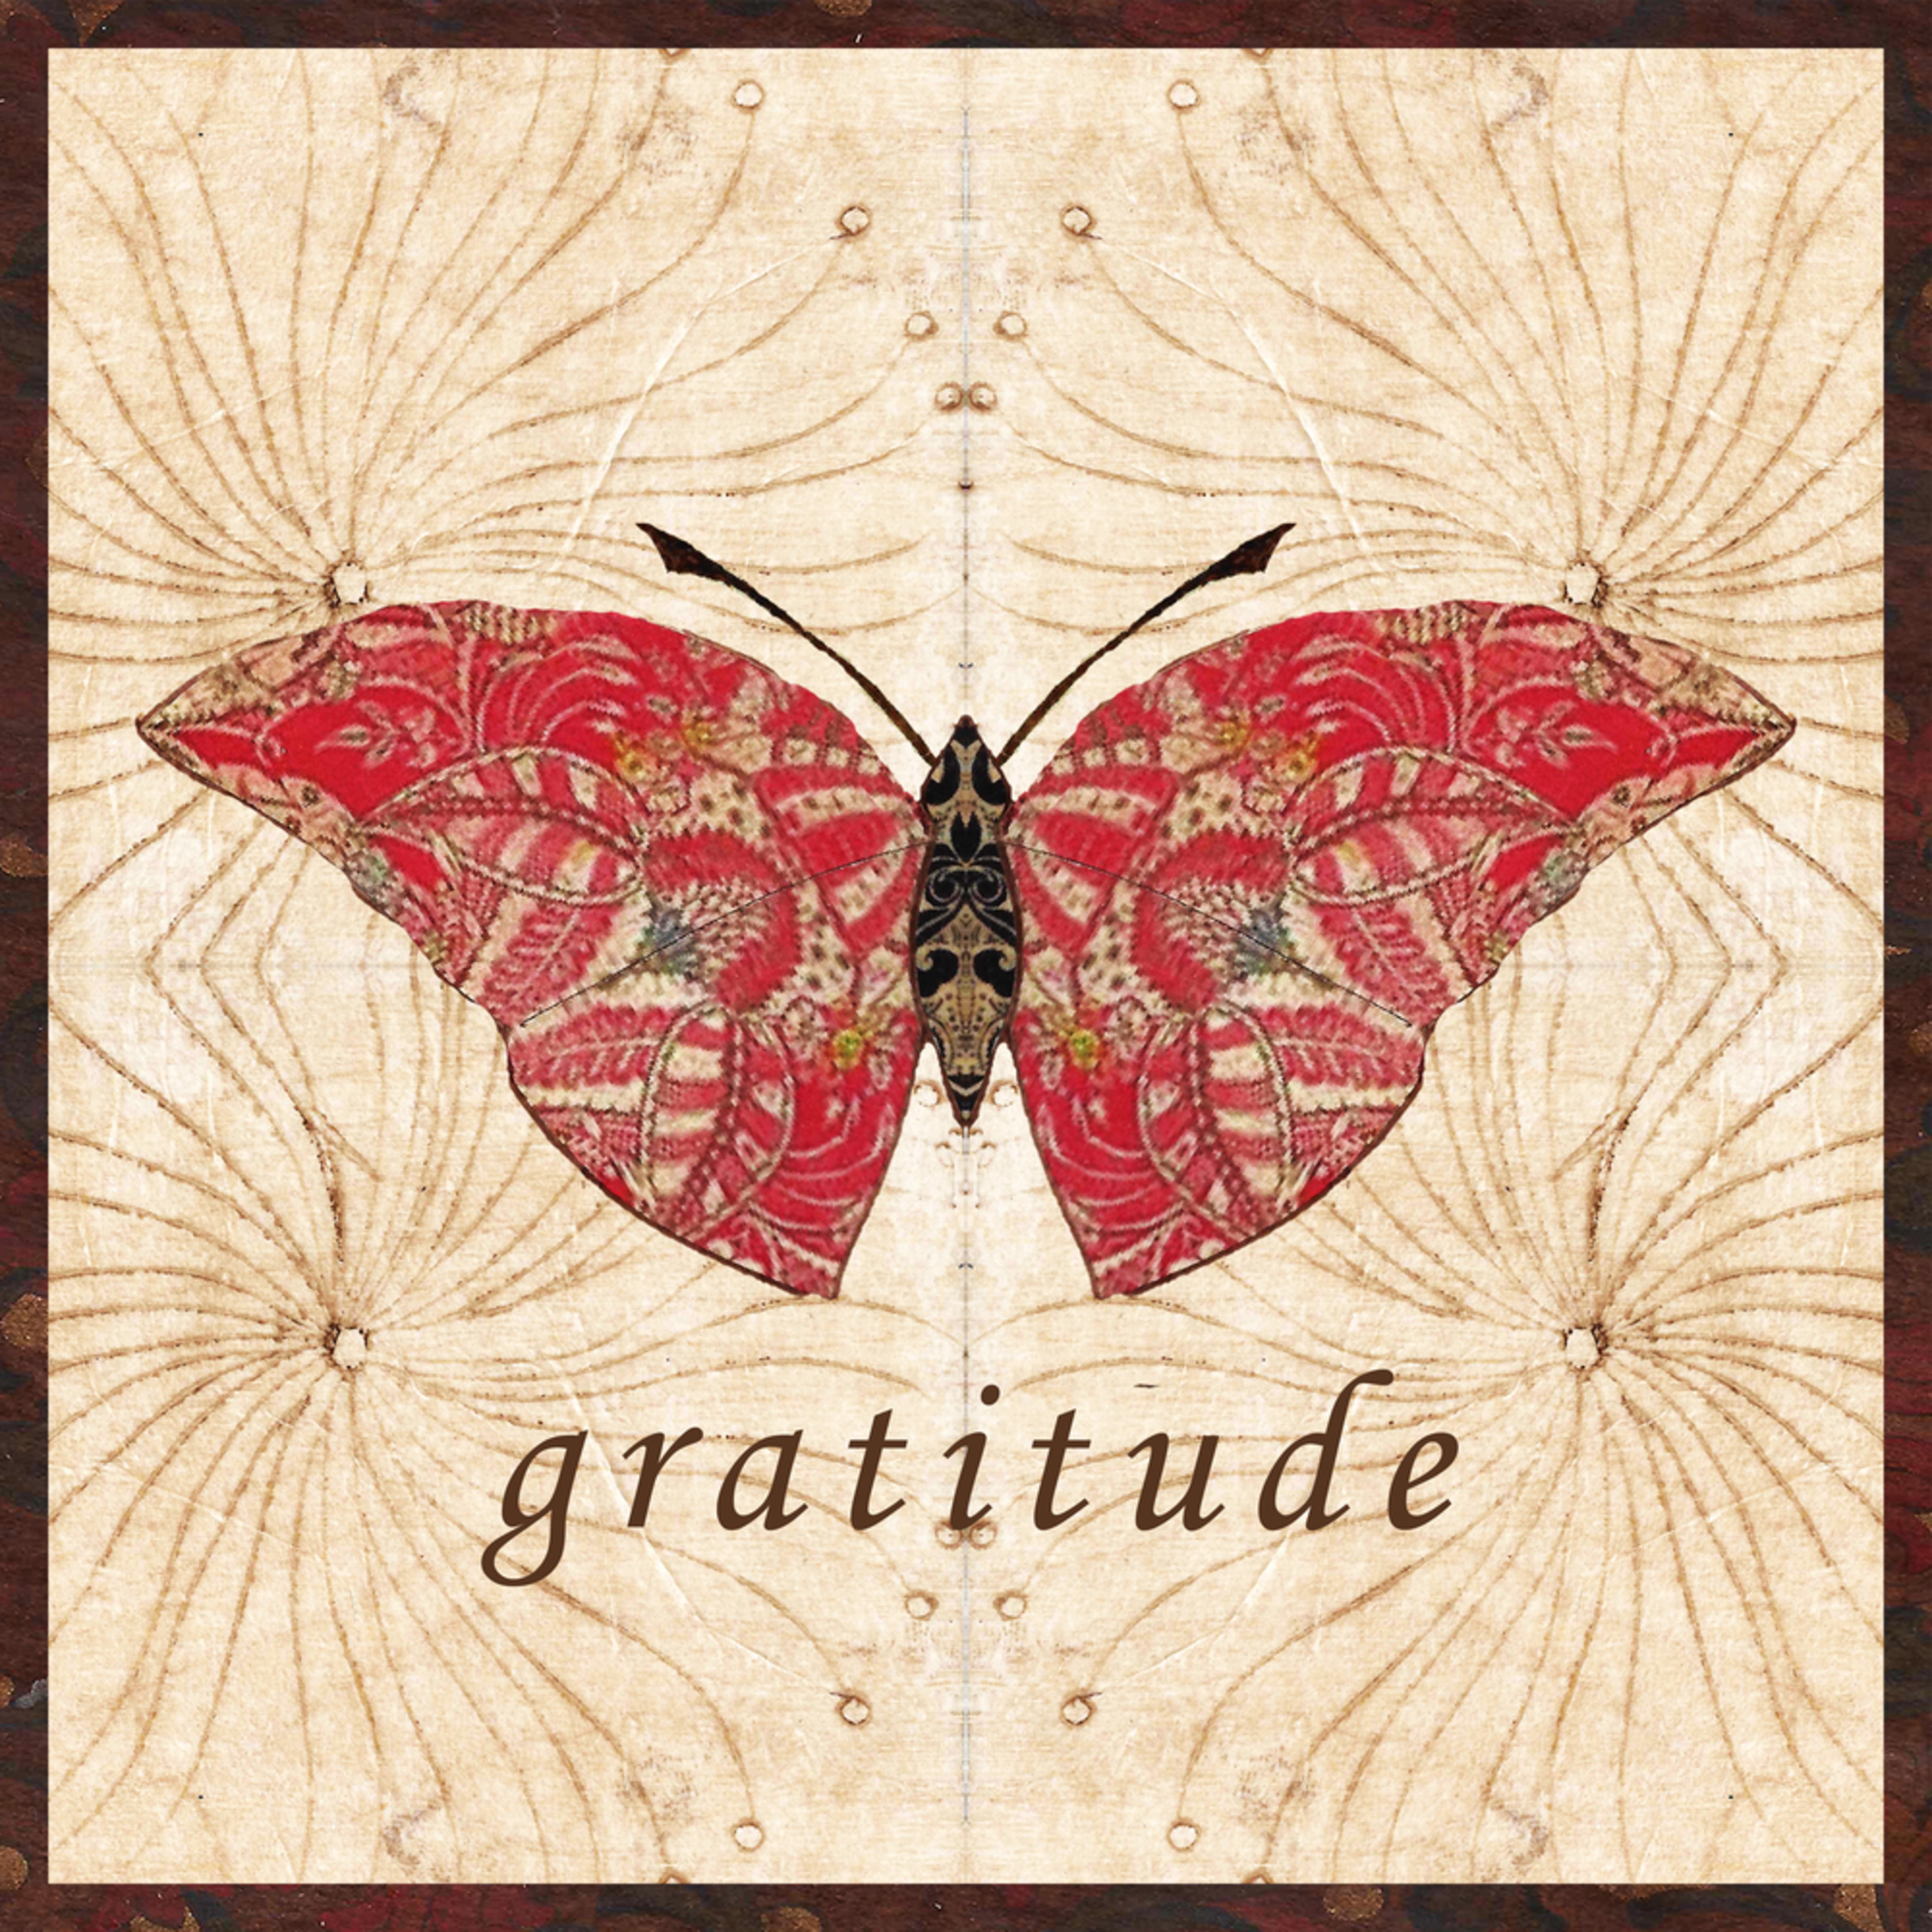 Gratitude qpgsup